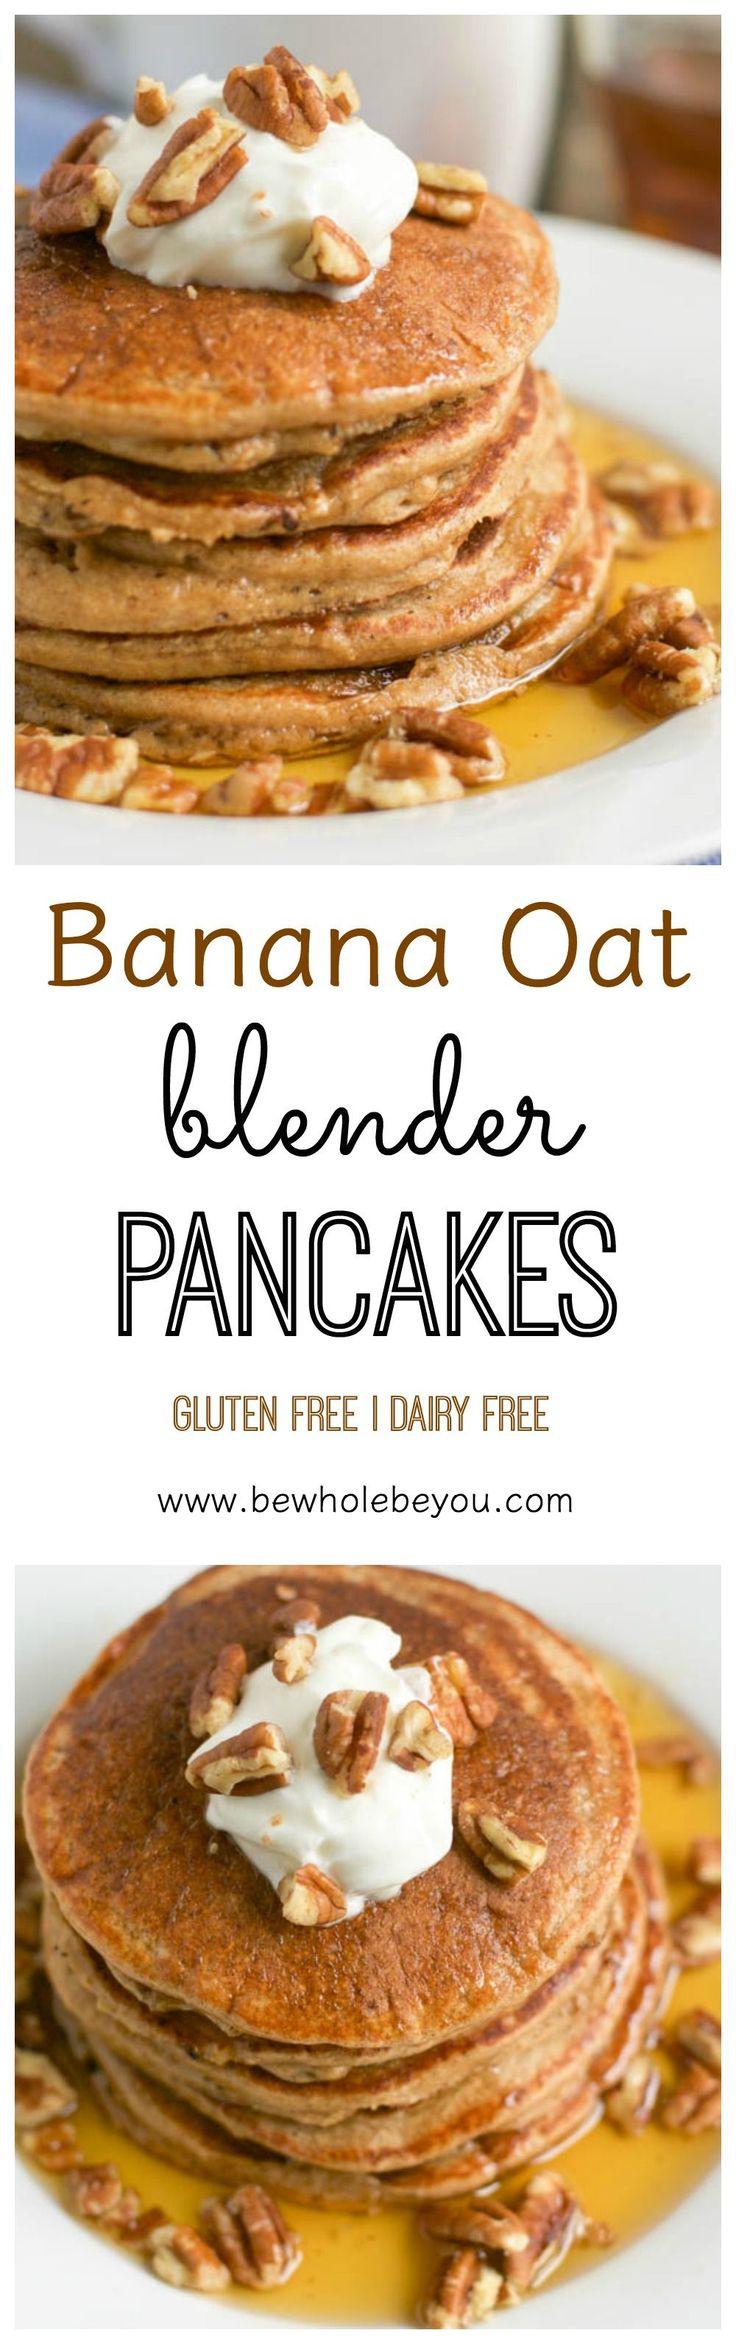 Banana Oat Blender Pancakes. Be Whole. Be You.